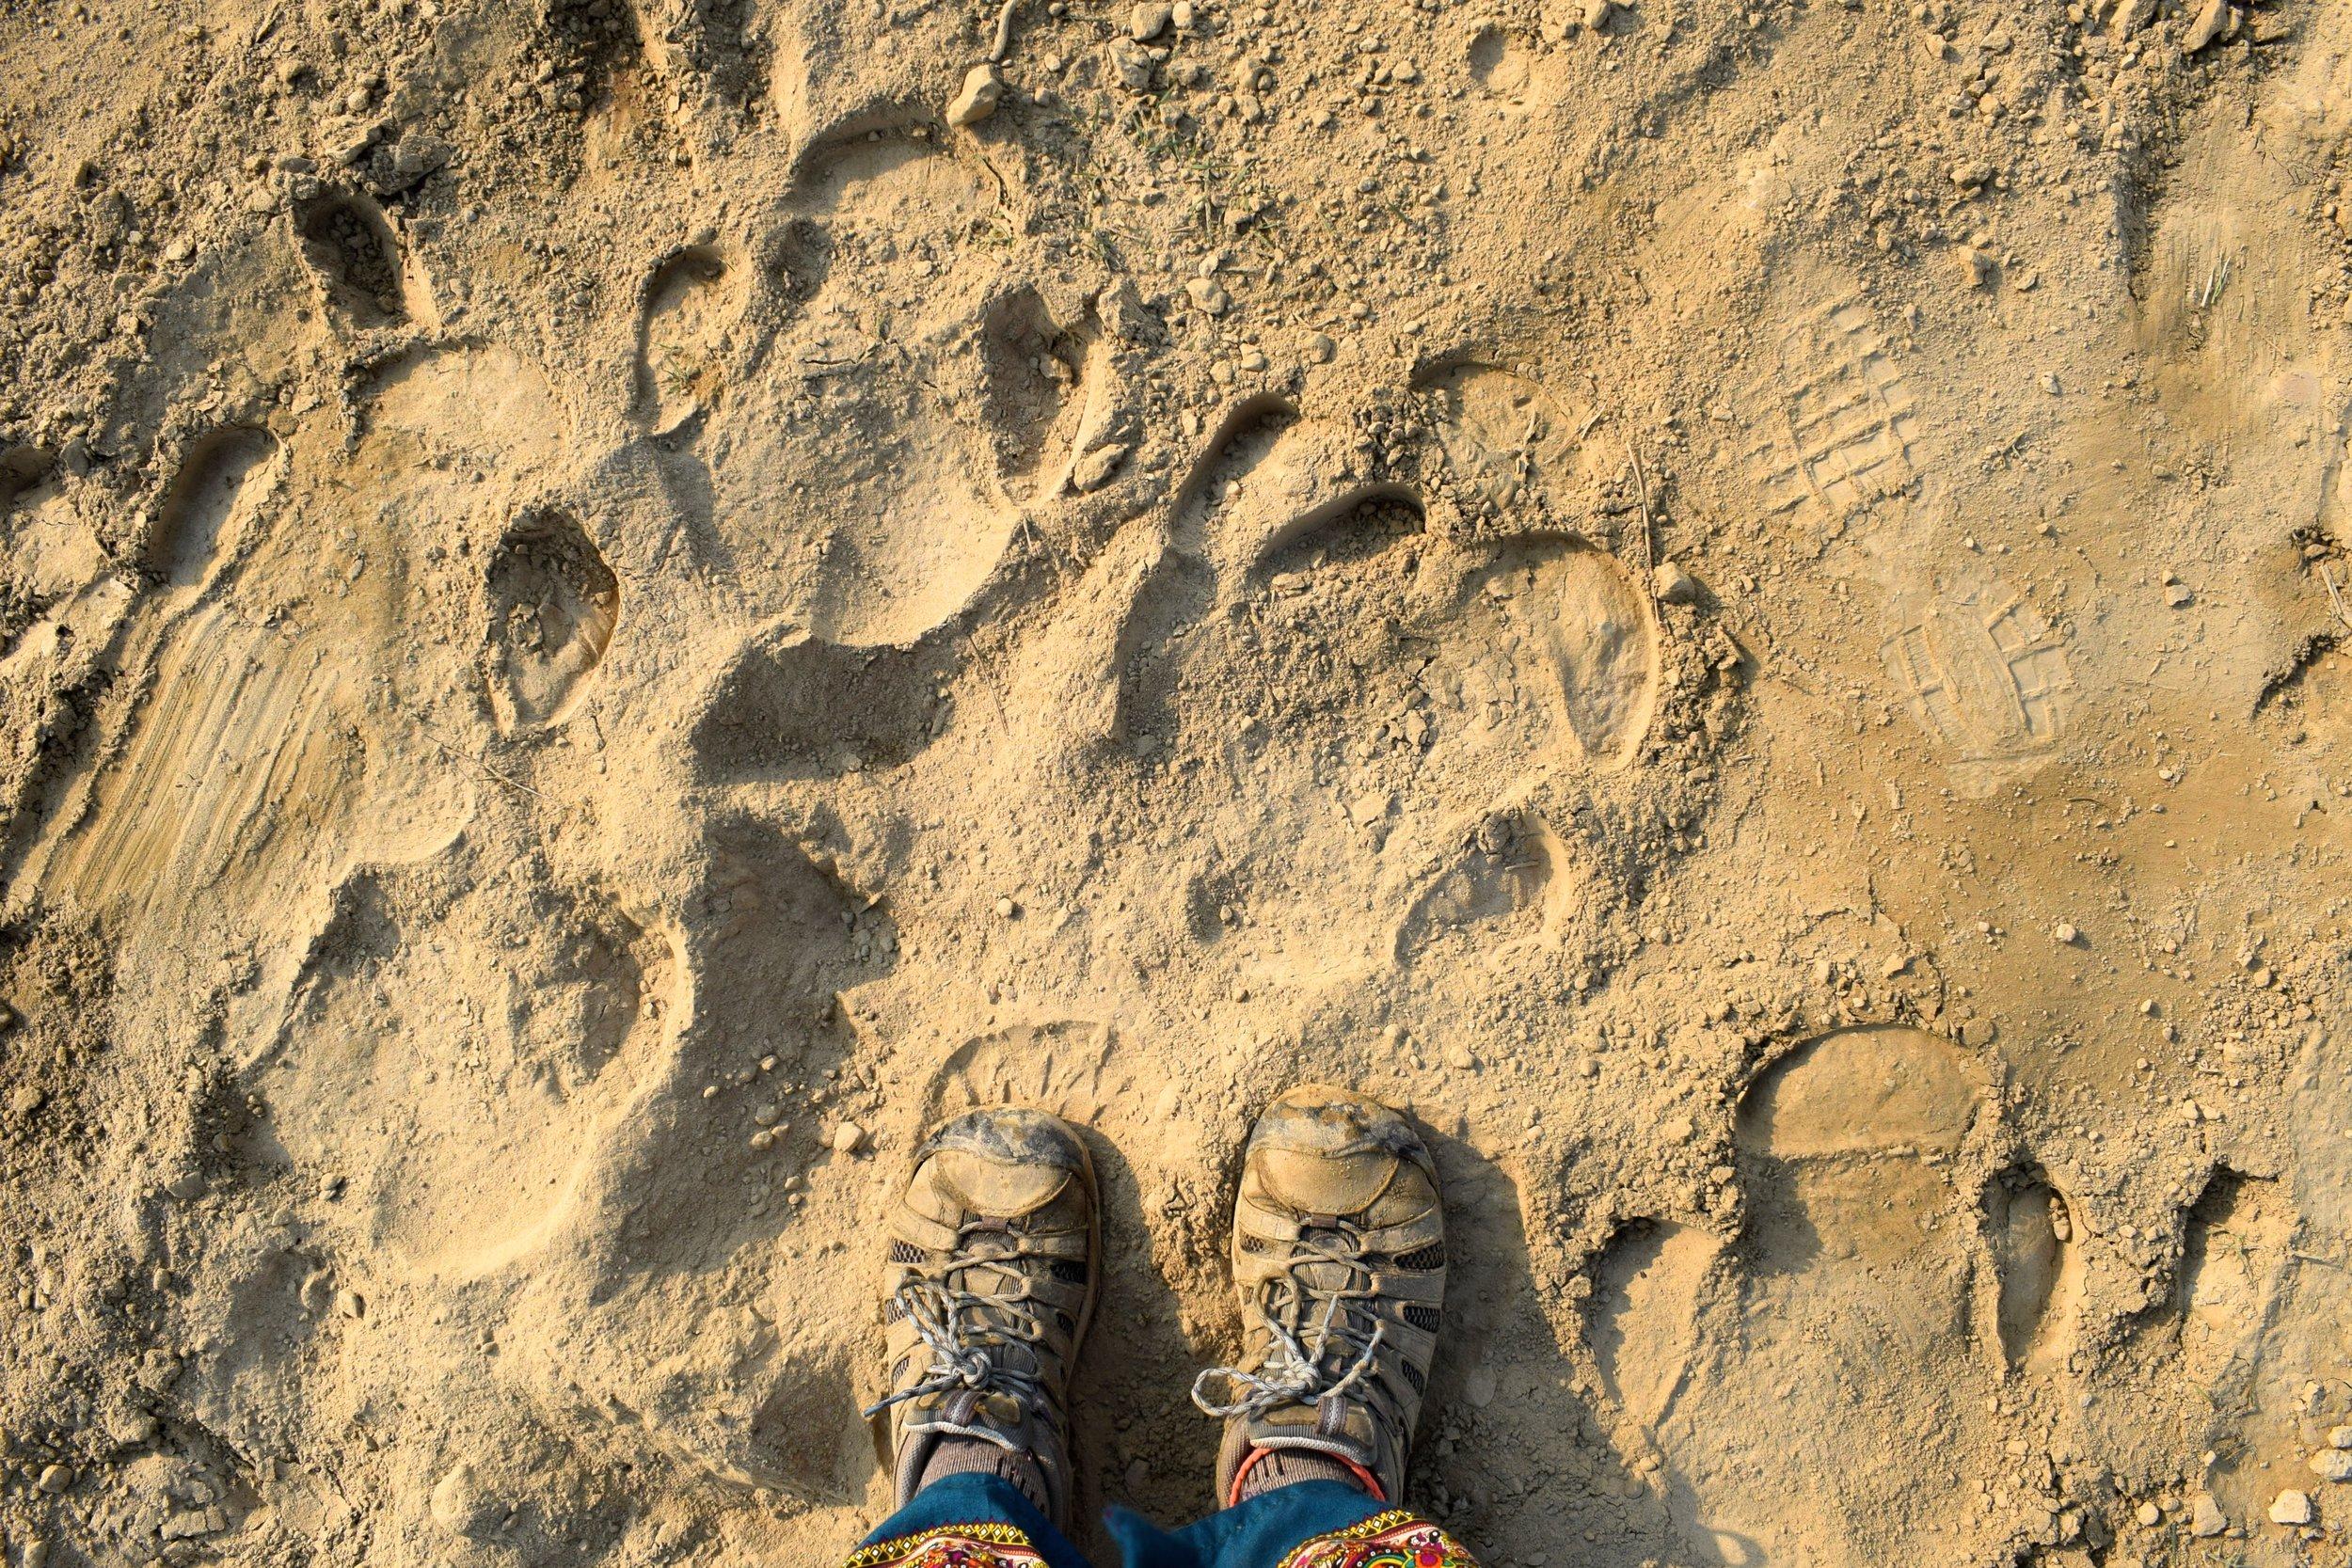 Rhino footprints on the sandy trail